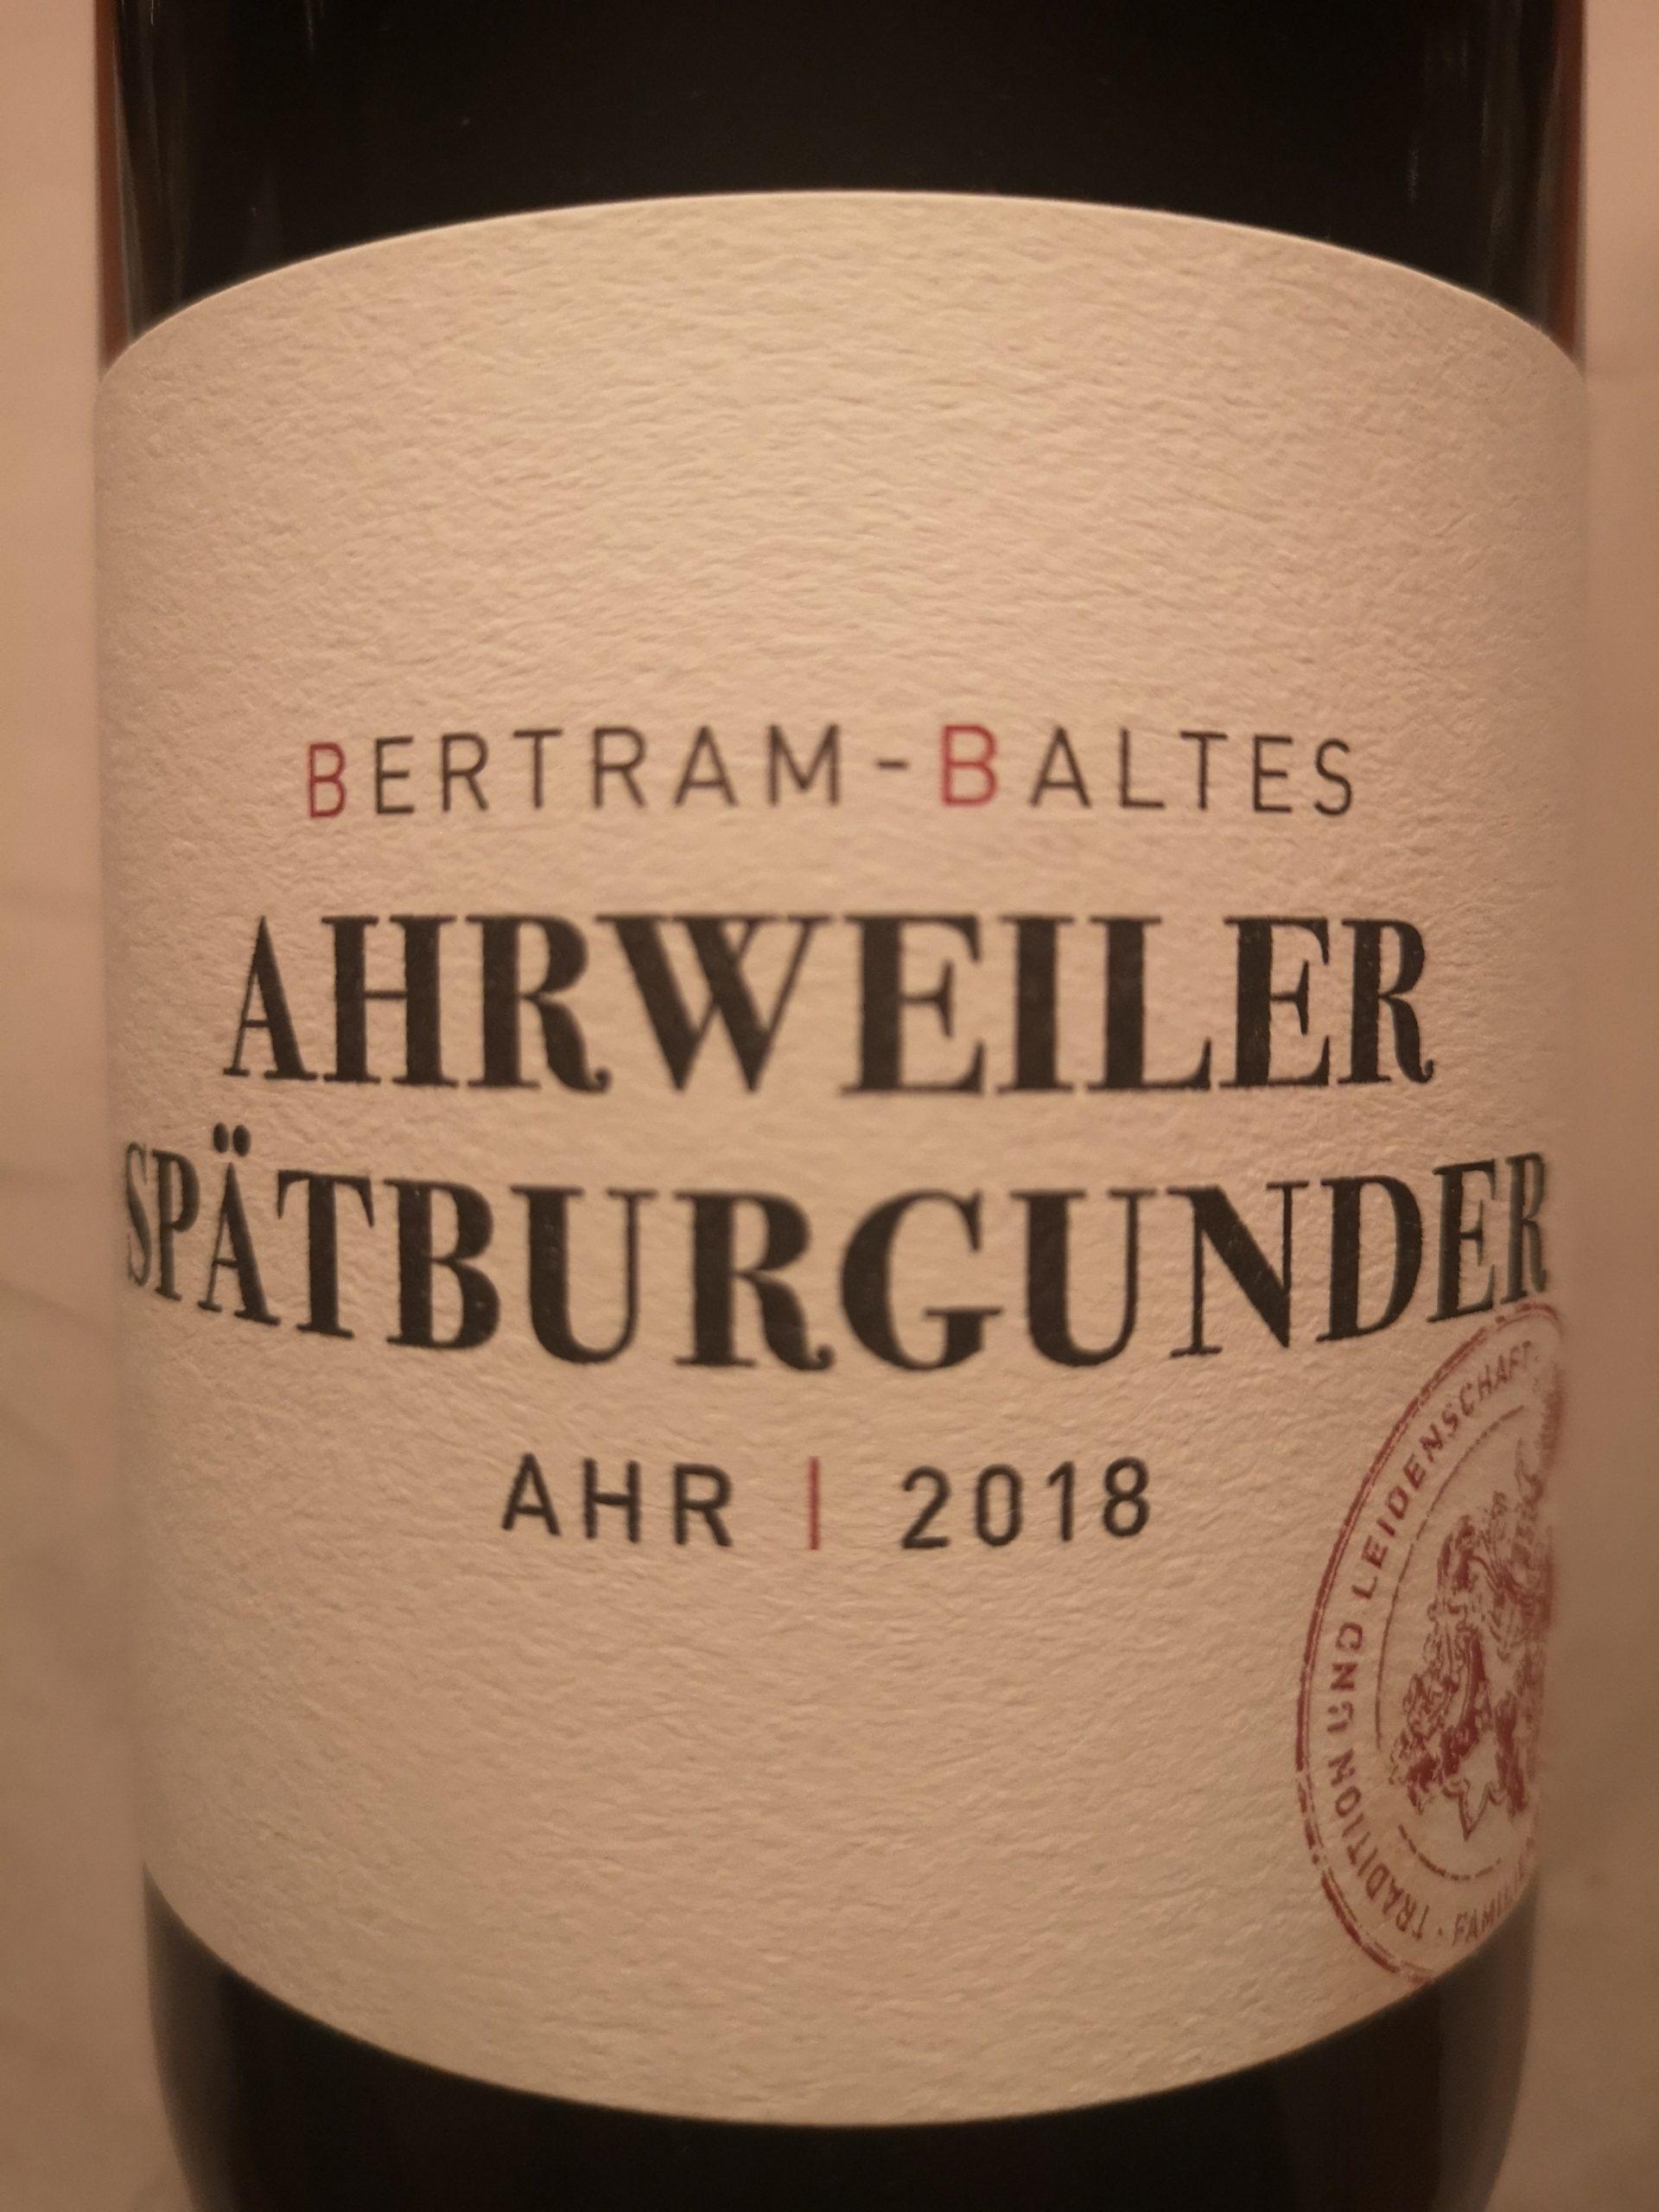 2018 Spätburgunder Ahrweiler trocken | Bertram-Baltes